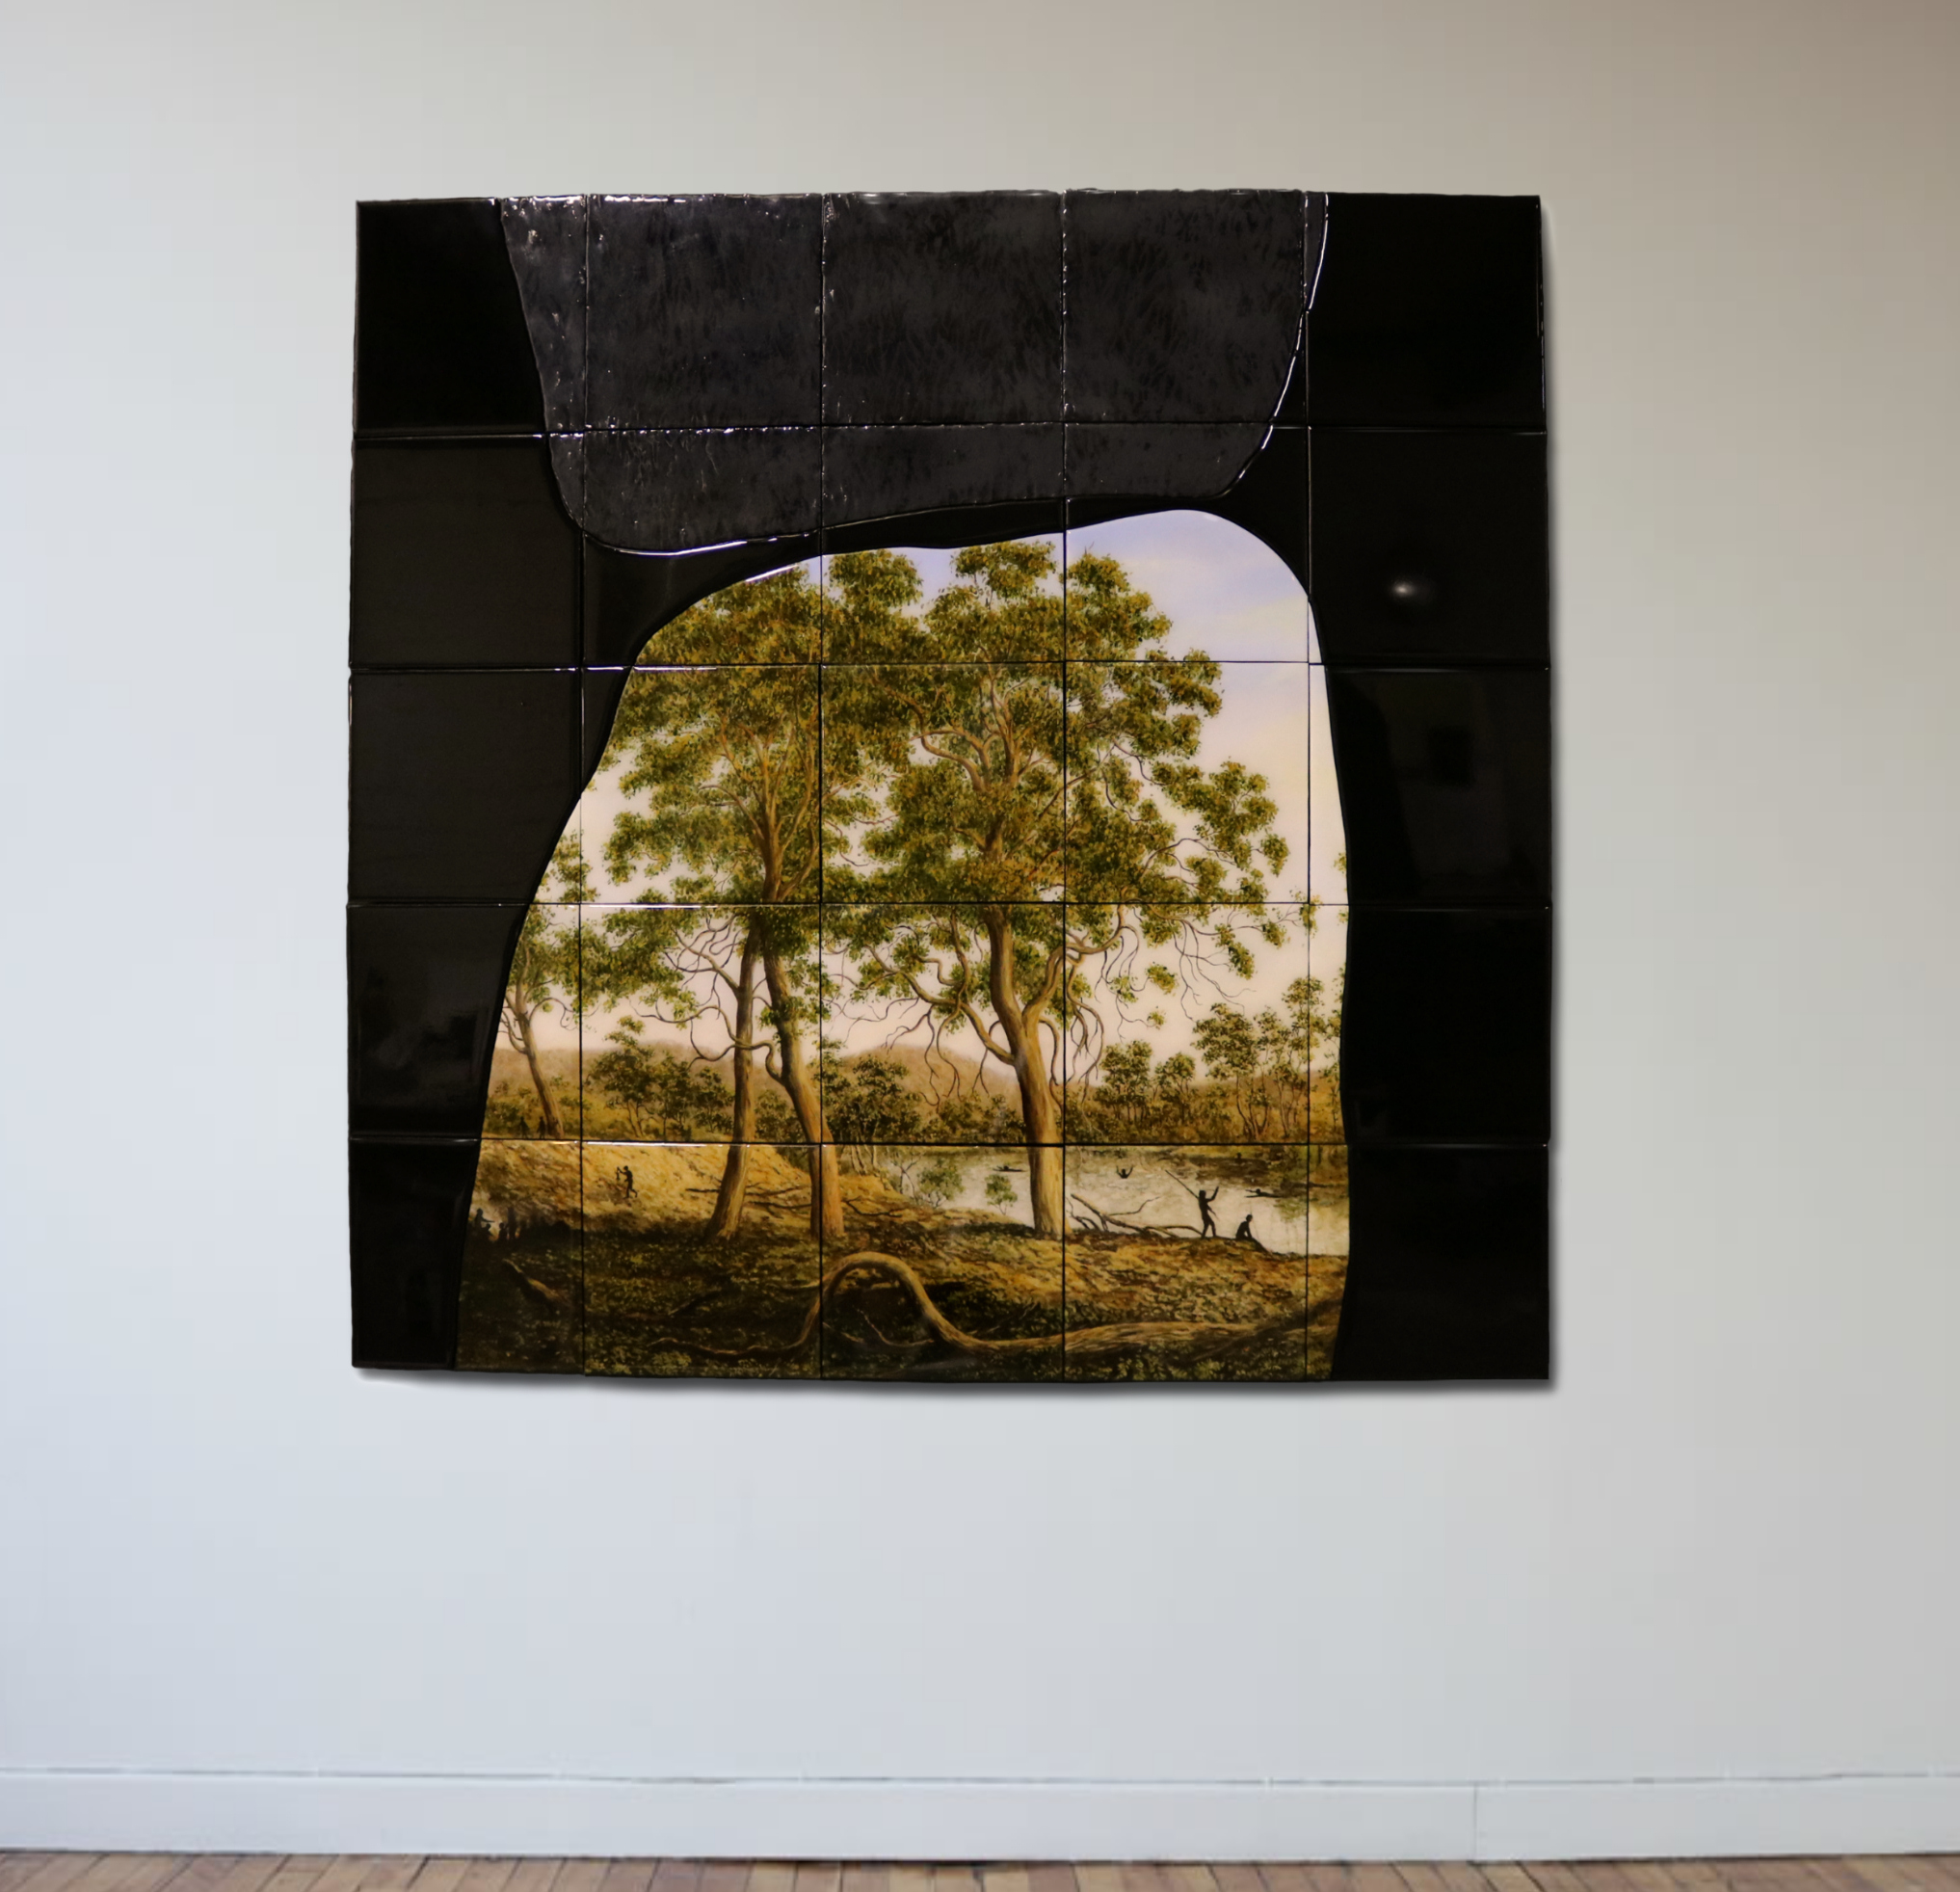 -Fenton-Robert-The last landscape